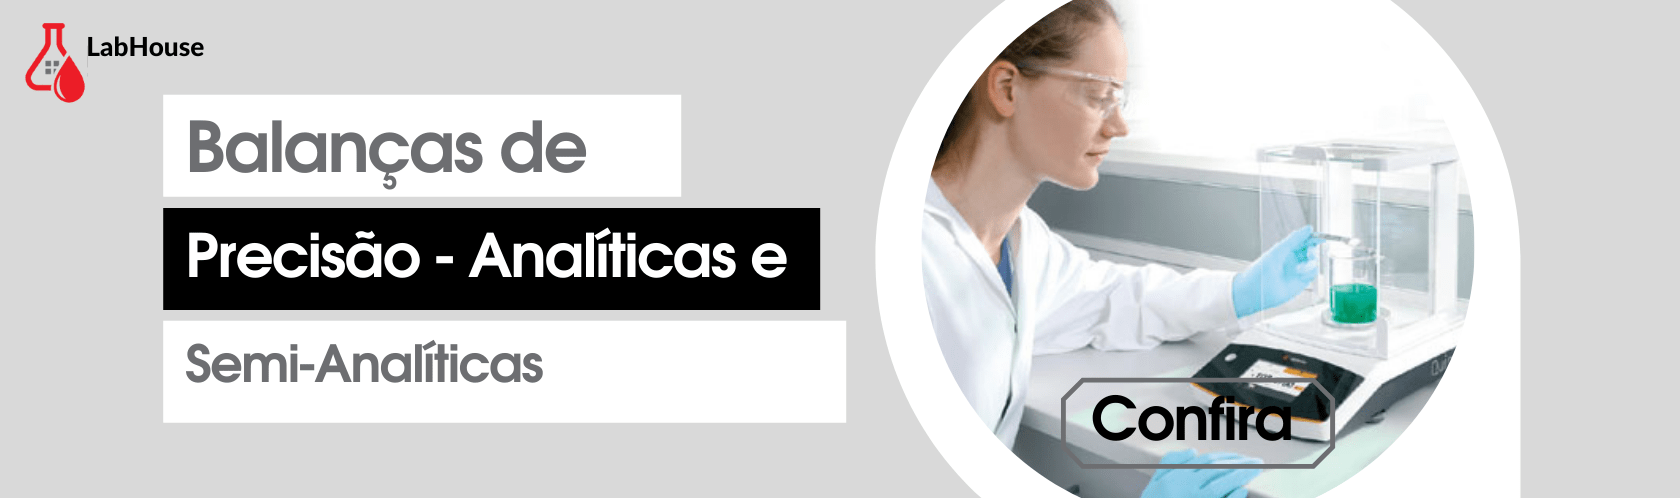 data/banner/balancas.png